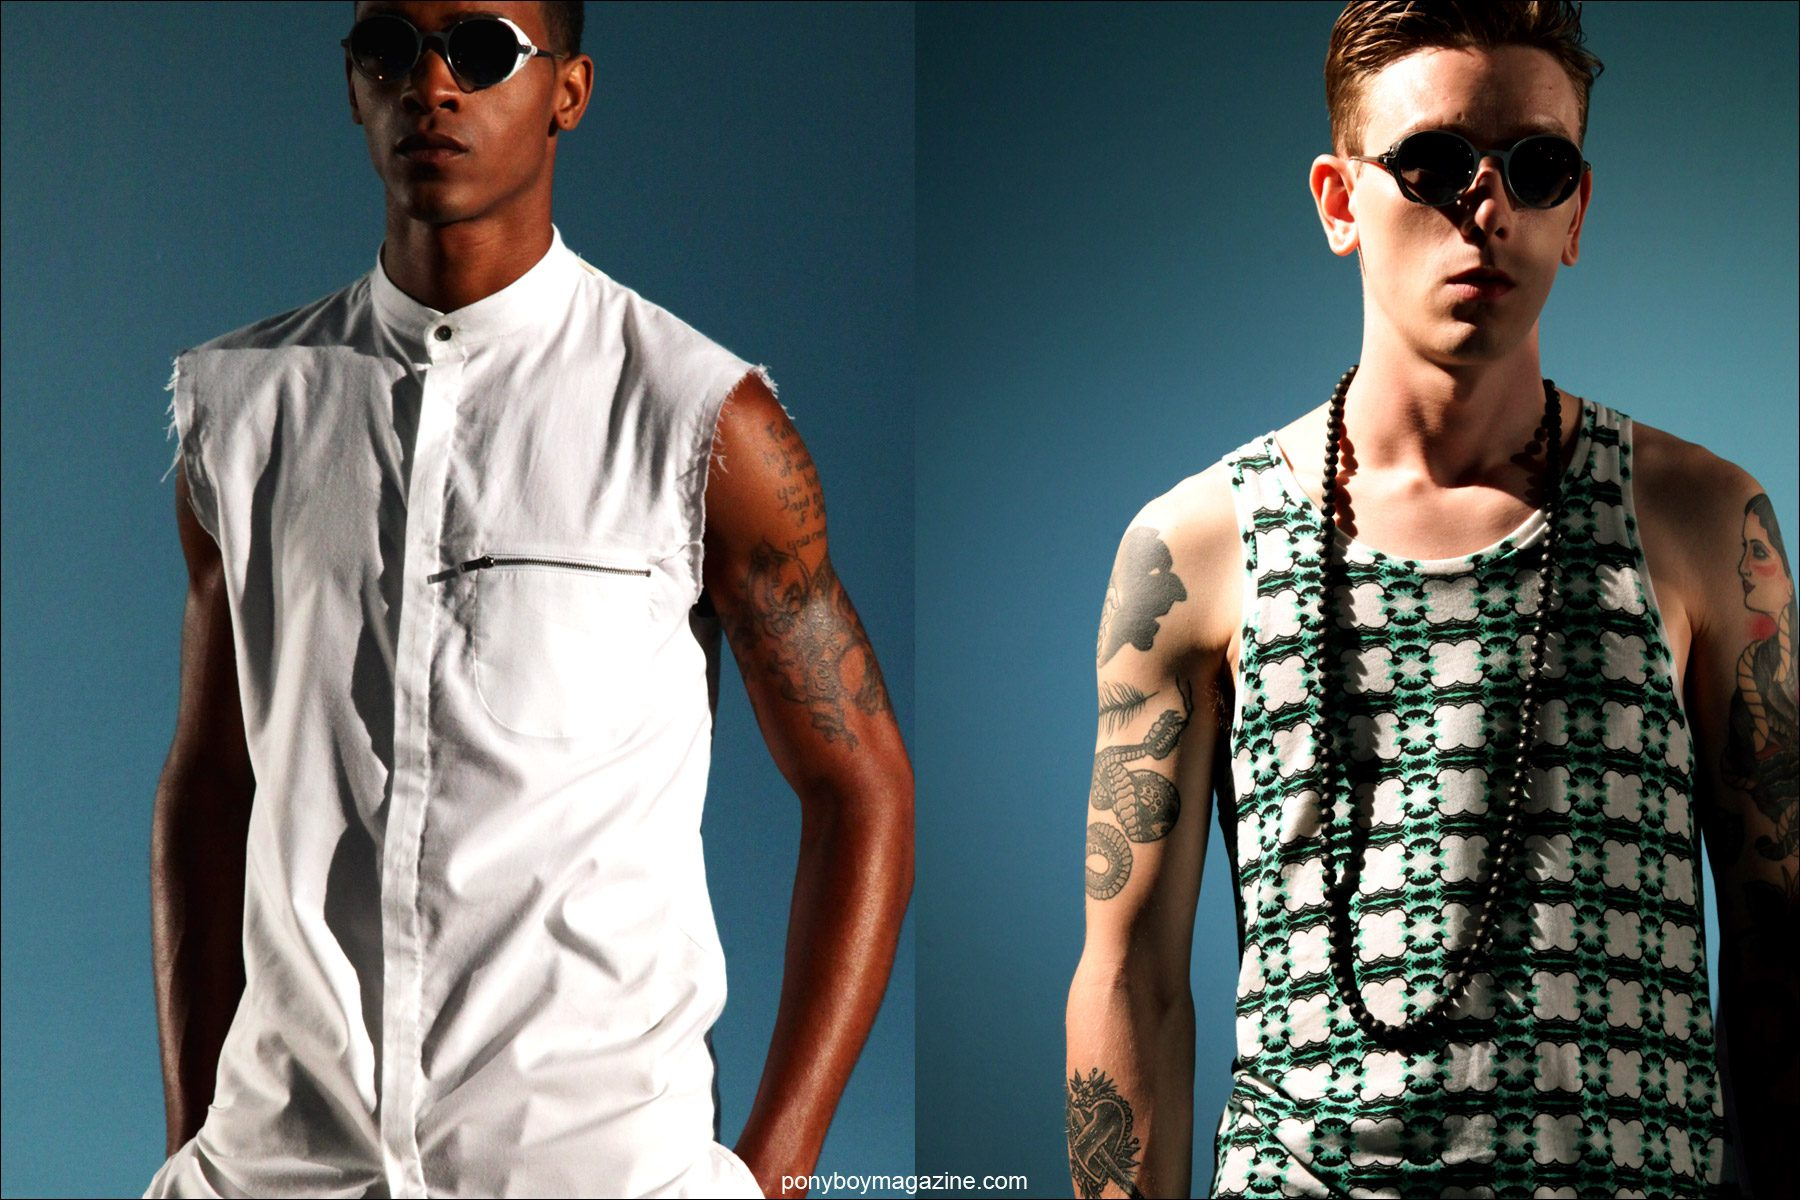 Male models in sleeveless shirts at Rochambeau S/S15 presentation at Milk Studios. Photographs by Alexander Thompson for Ponyboy Magazine.